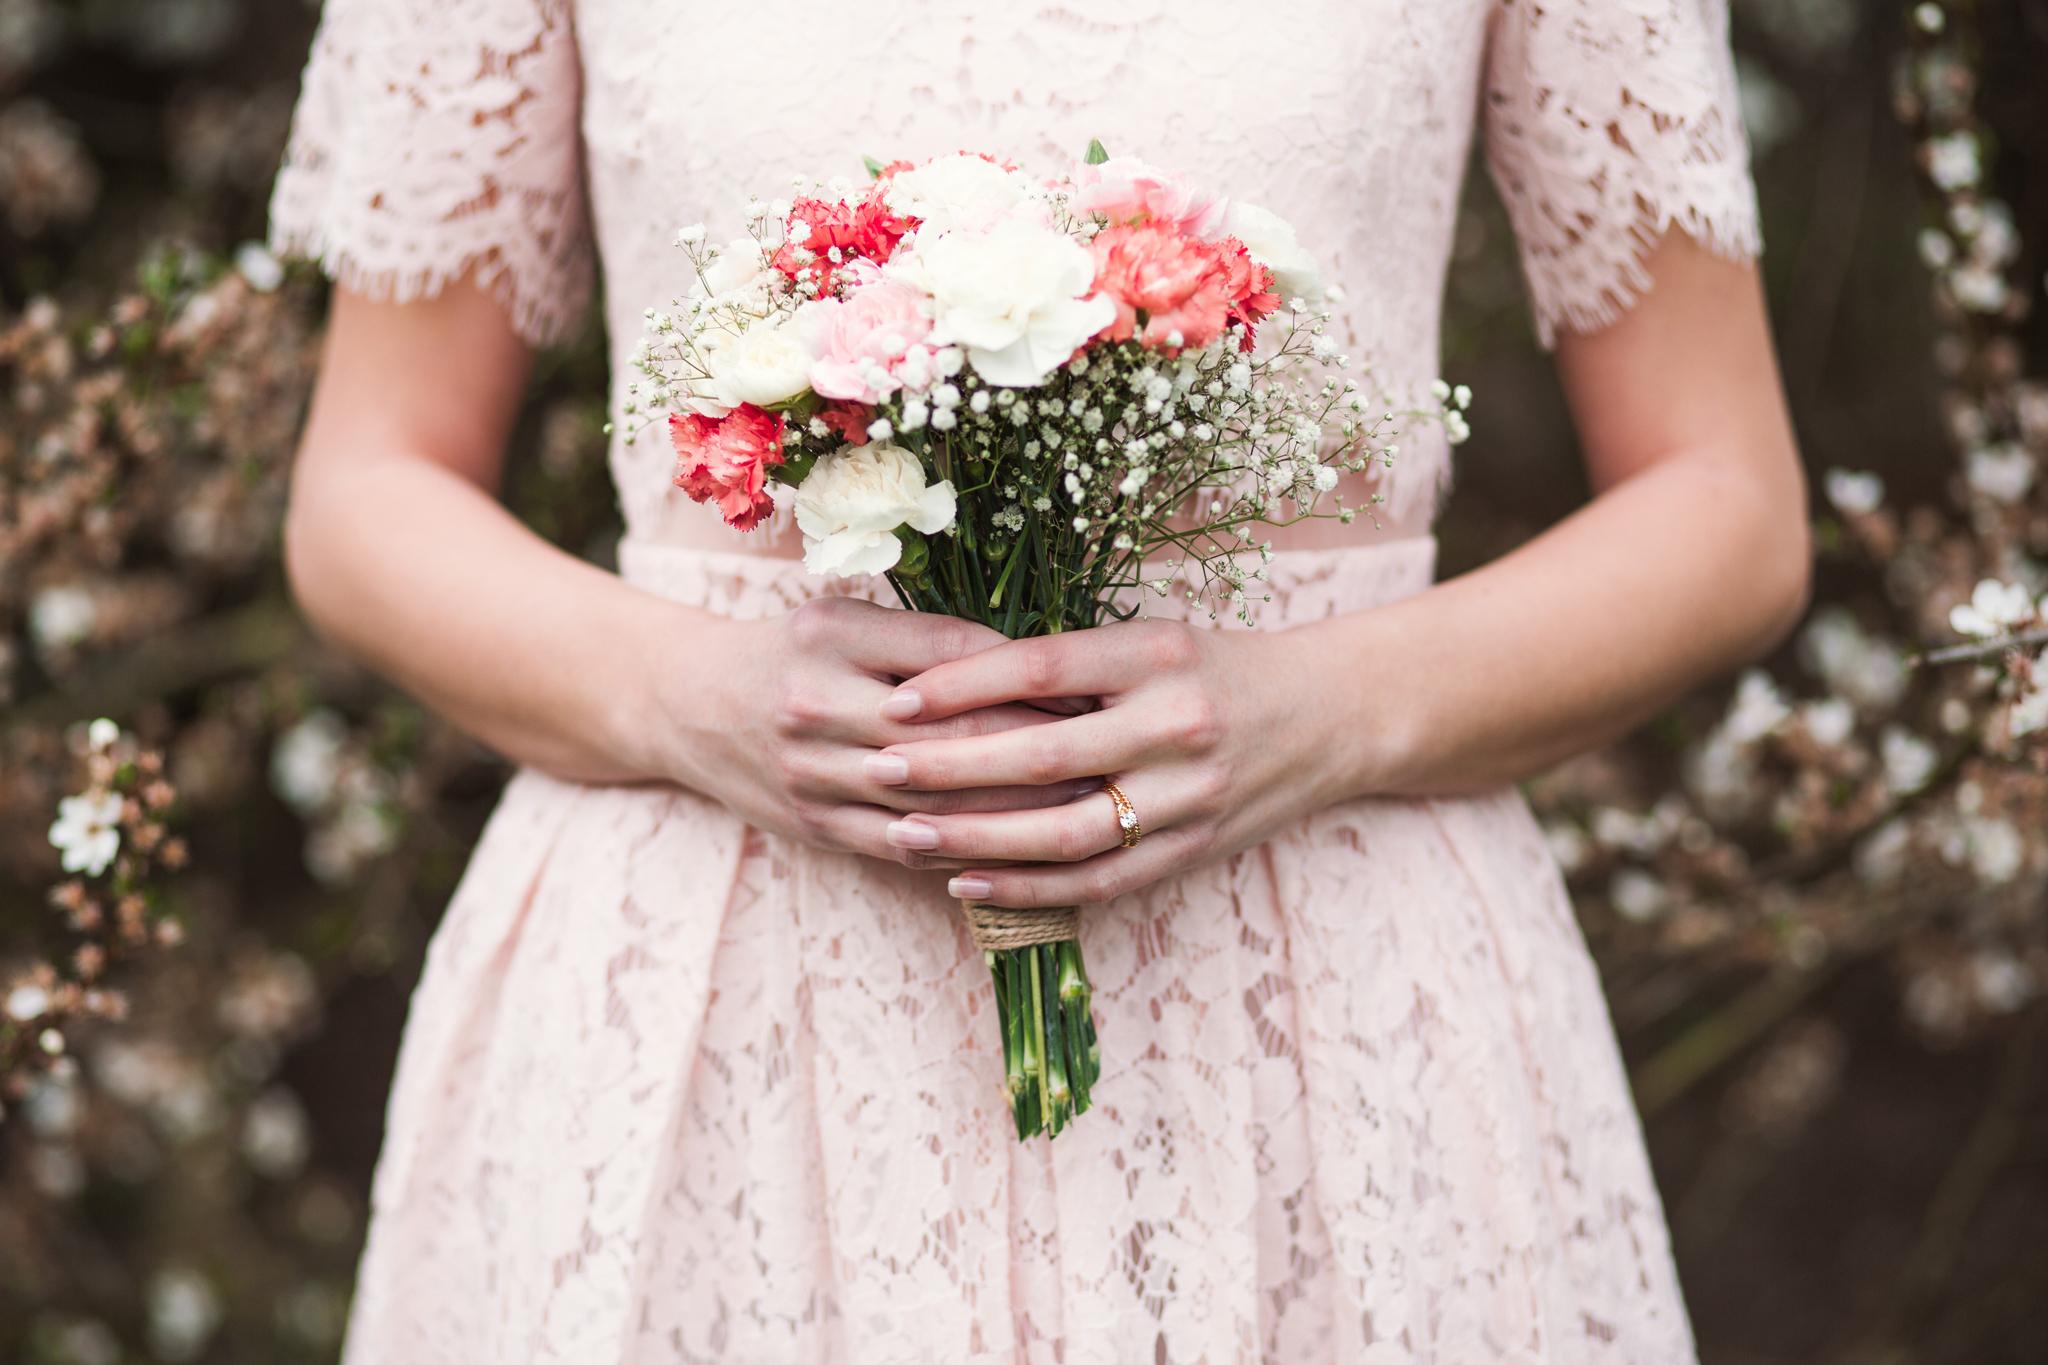 styled-wedding-bridal-shoot-blossom-14